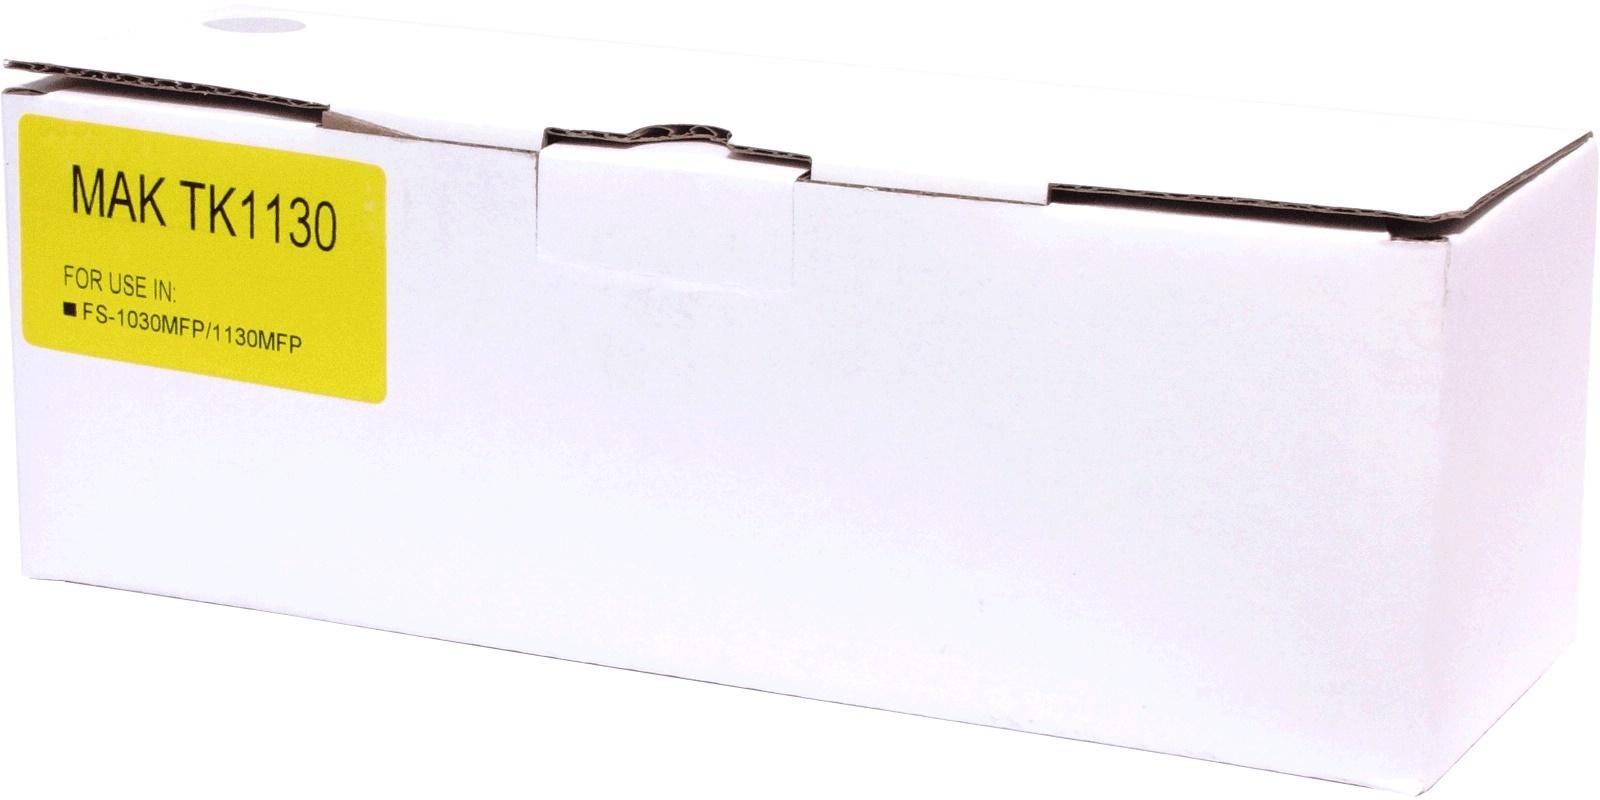 Kyocera MAK TK-1130, черный, до 3000 стр.